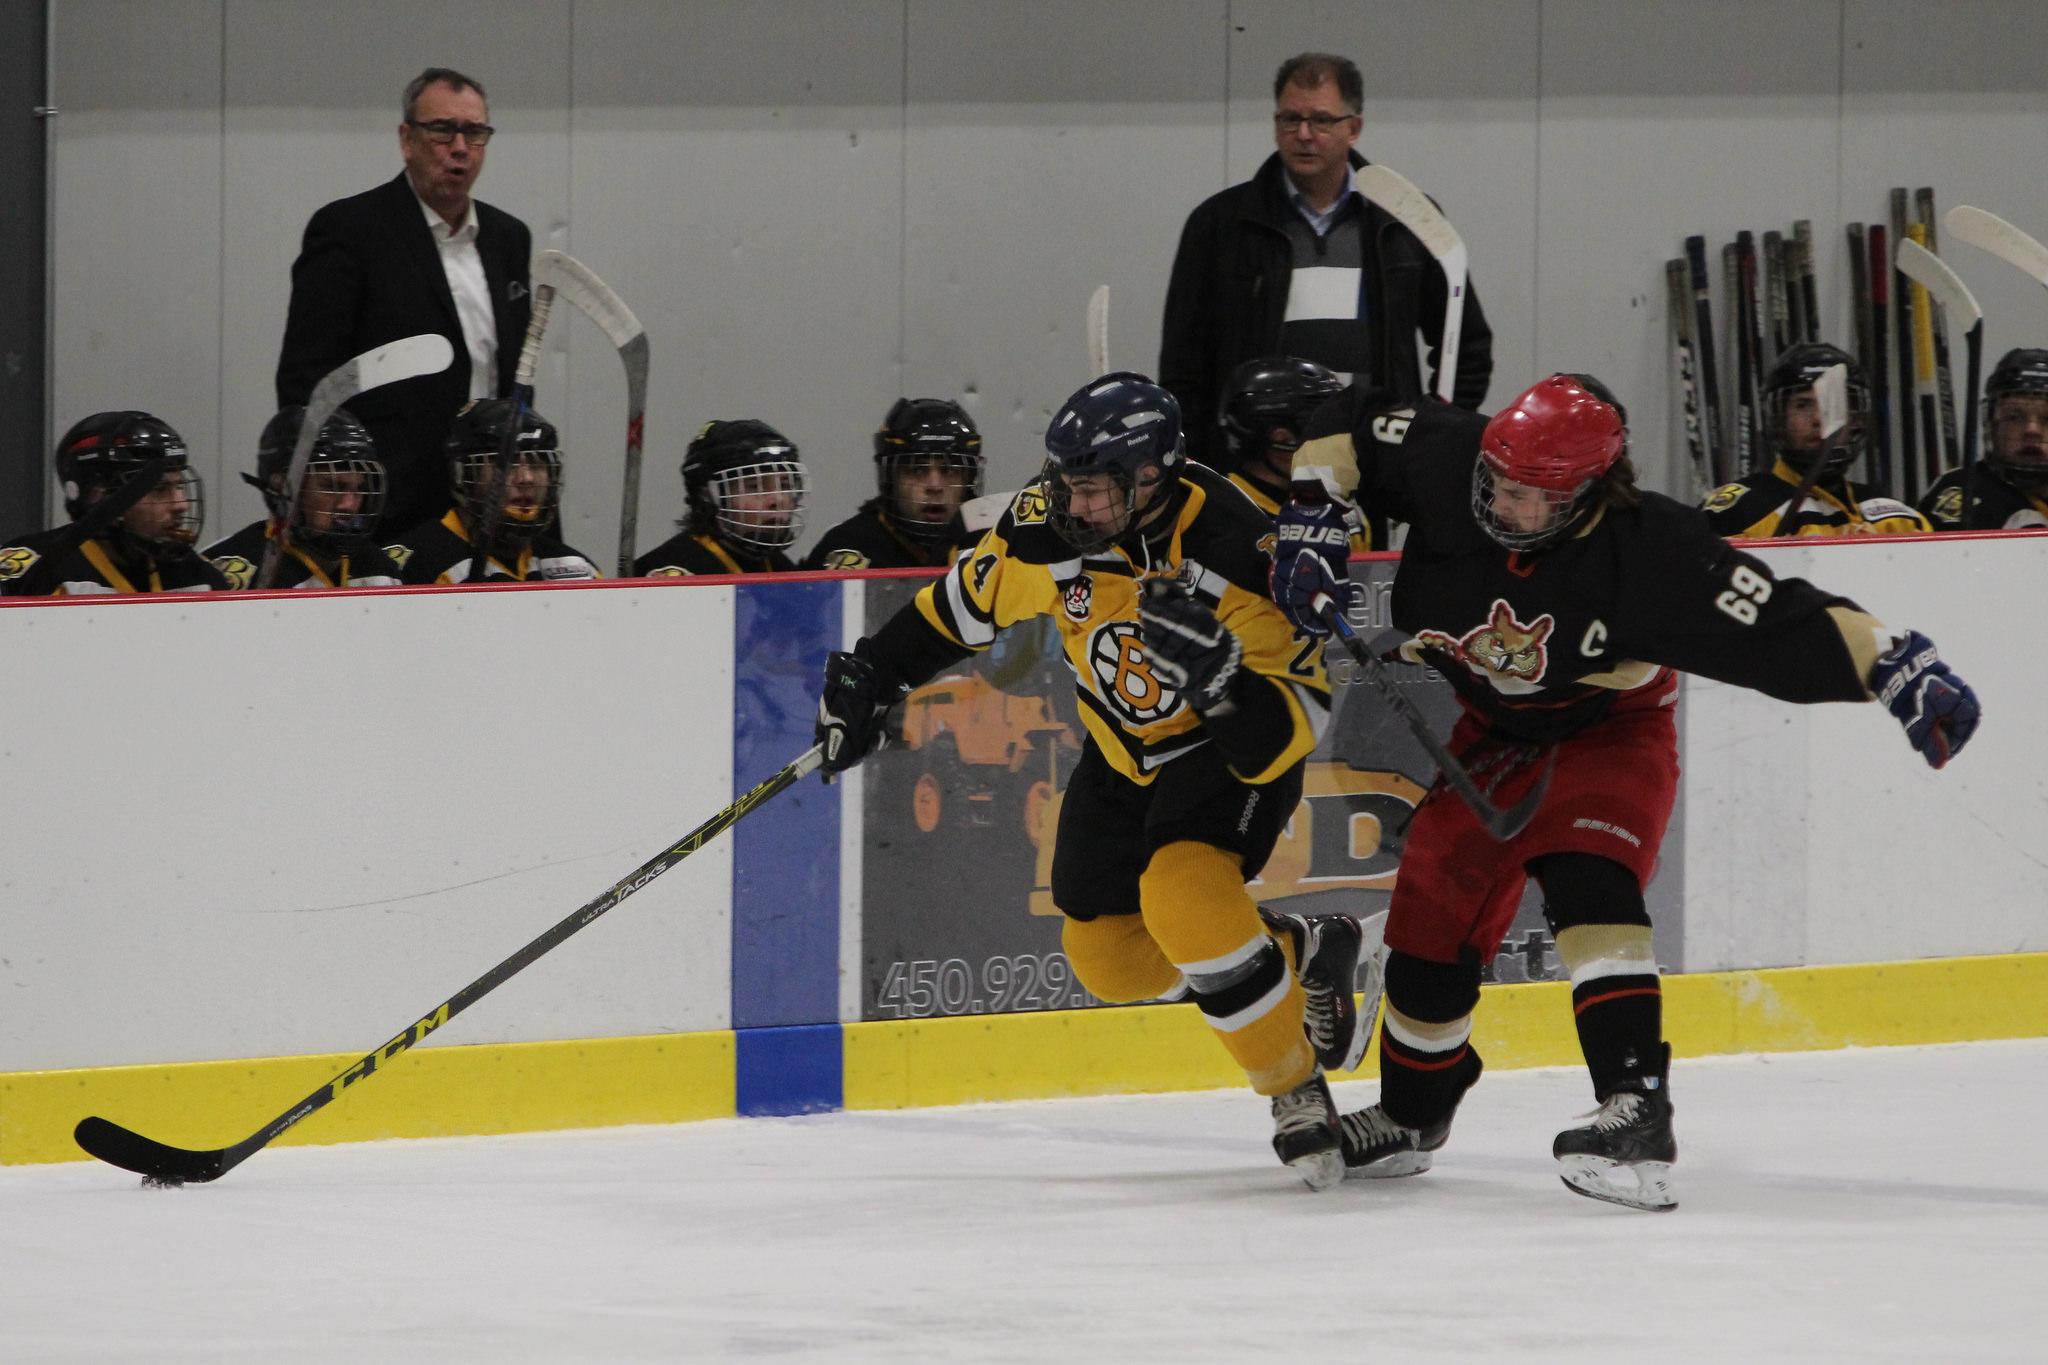 header_fantauntsinjuredhockeyplayer.jpg